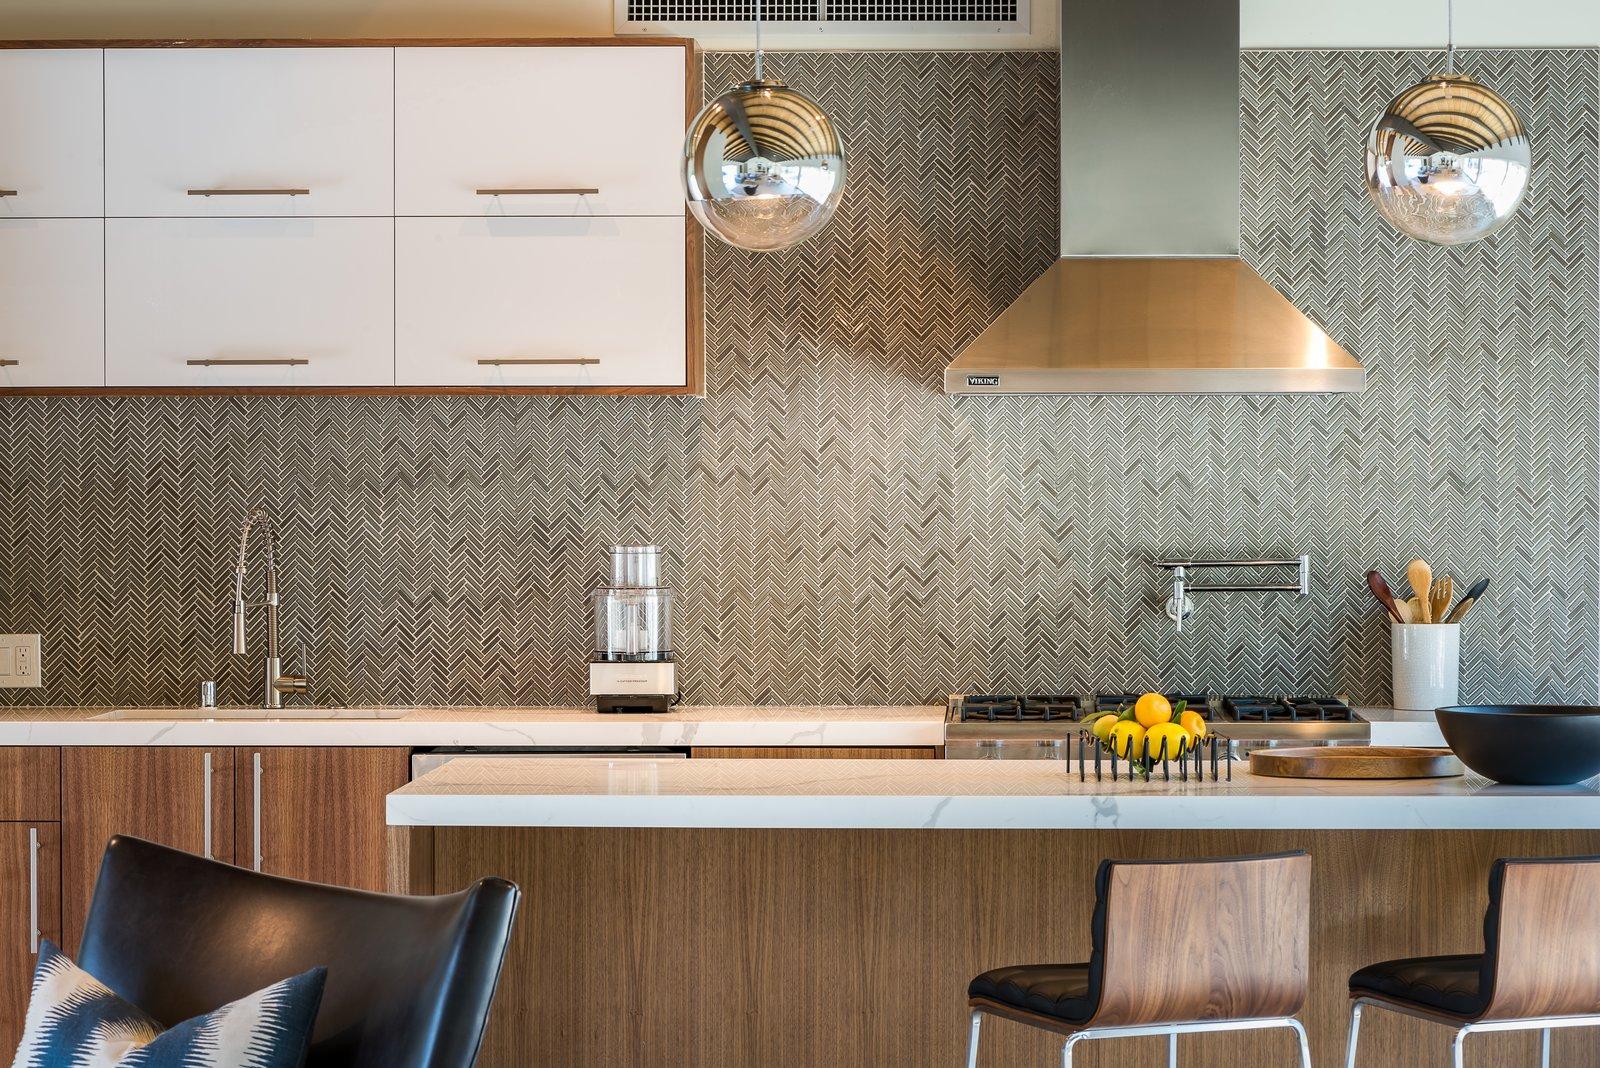 Kitchen, Wood Cabinet, Range, White Cabinet, Pendant Lighting, Porcelain Tile Backsplashe, and Range Hood A herringbone tile pattern forms the backsplash.  Photo 8 of 16 in An Updated Palm Springs Estate Lists For $2.4M